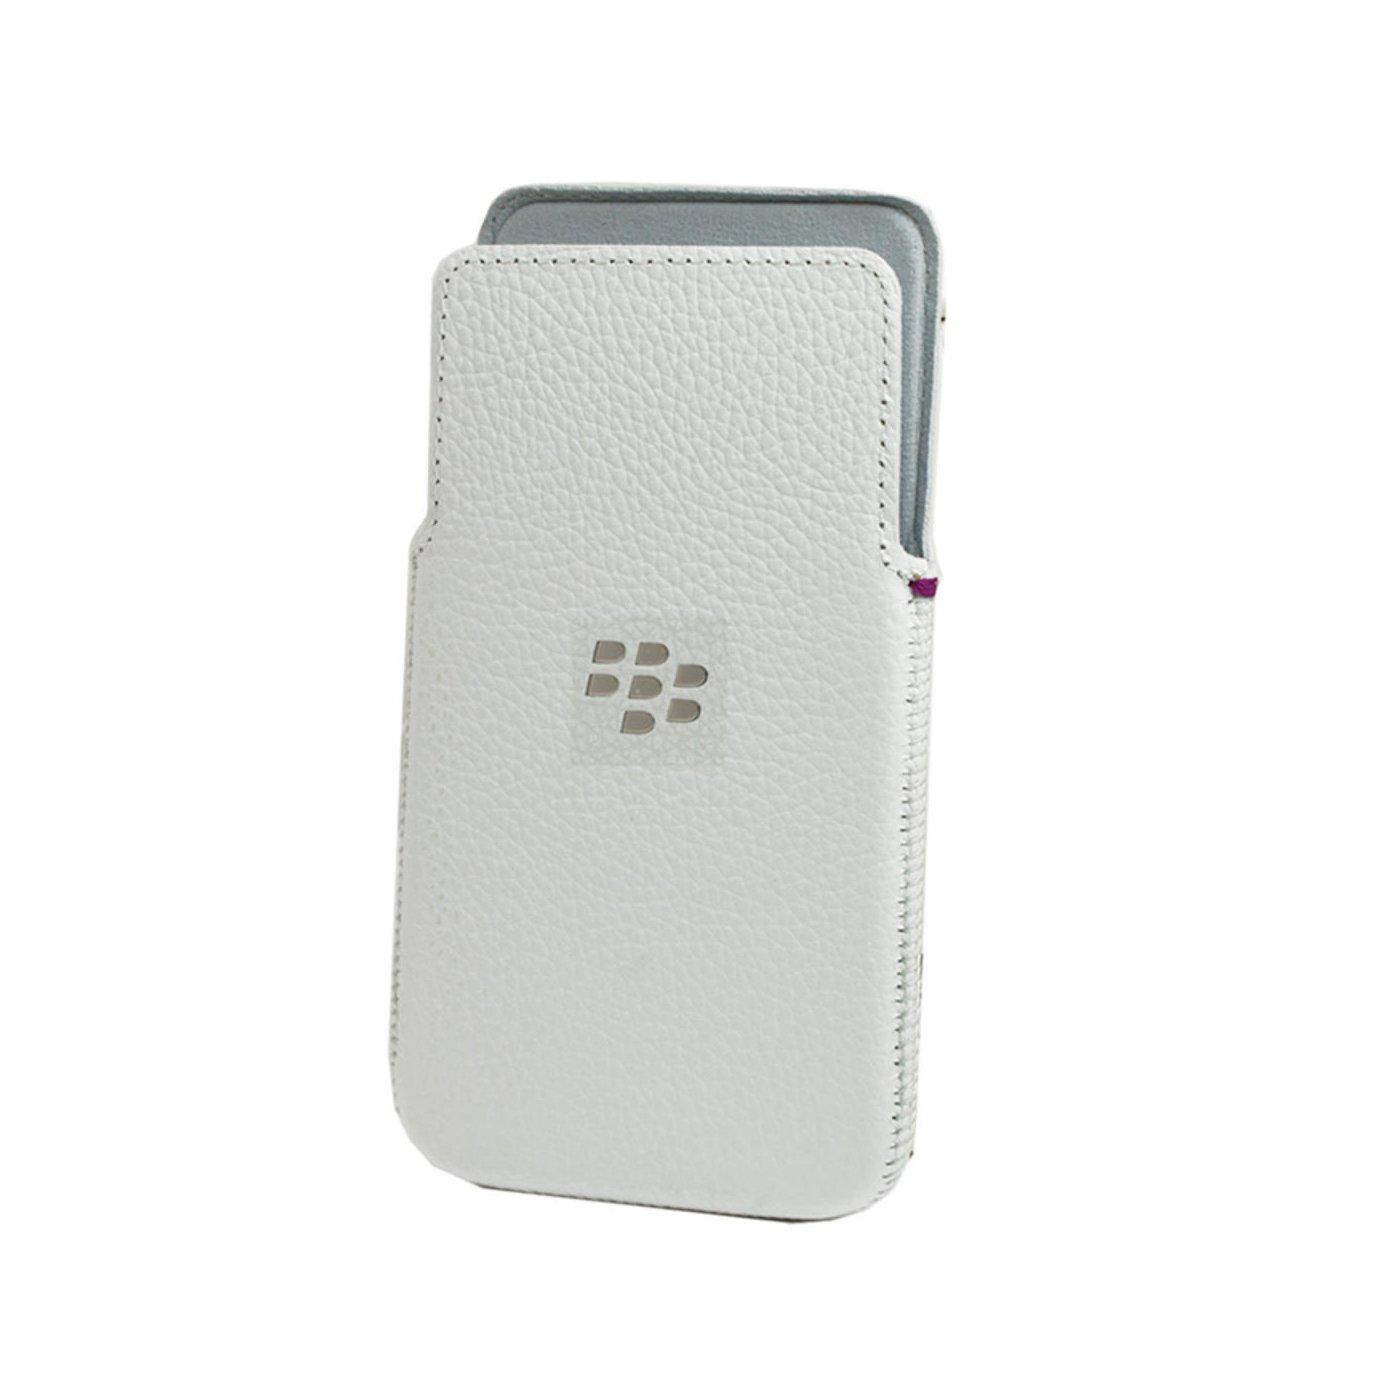 BlackBerry OEM Z30 White Leather Pocket